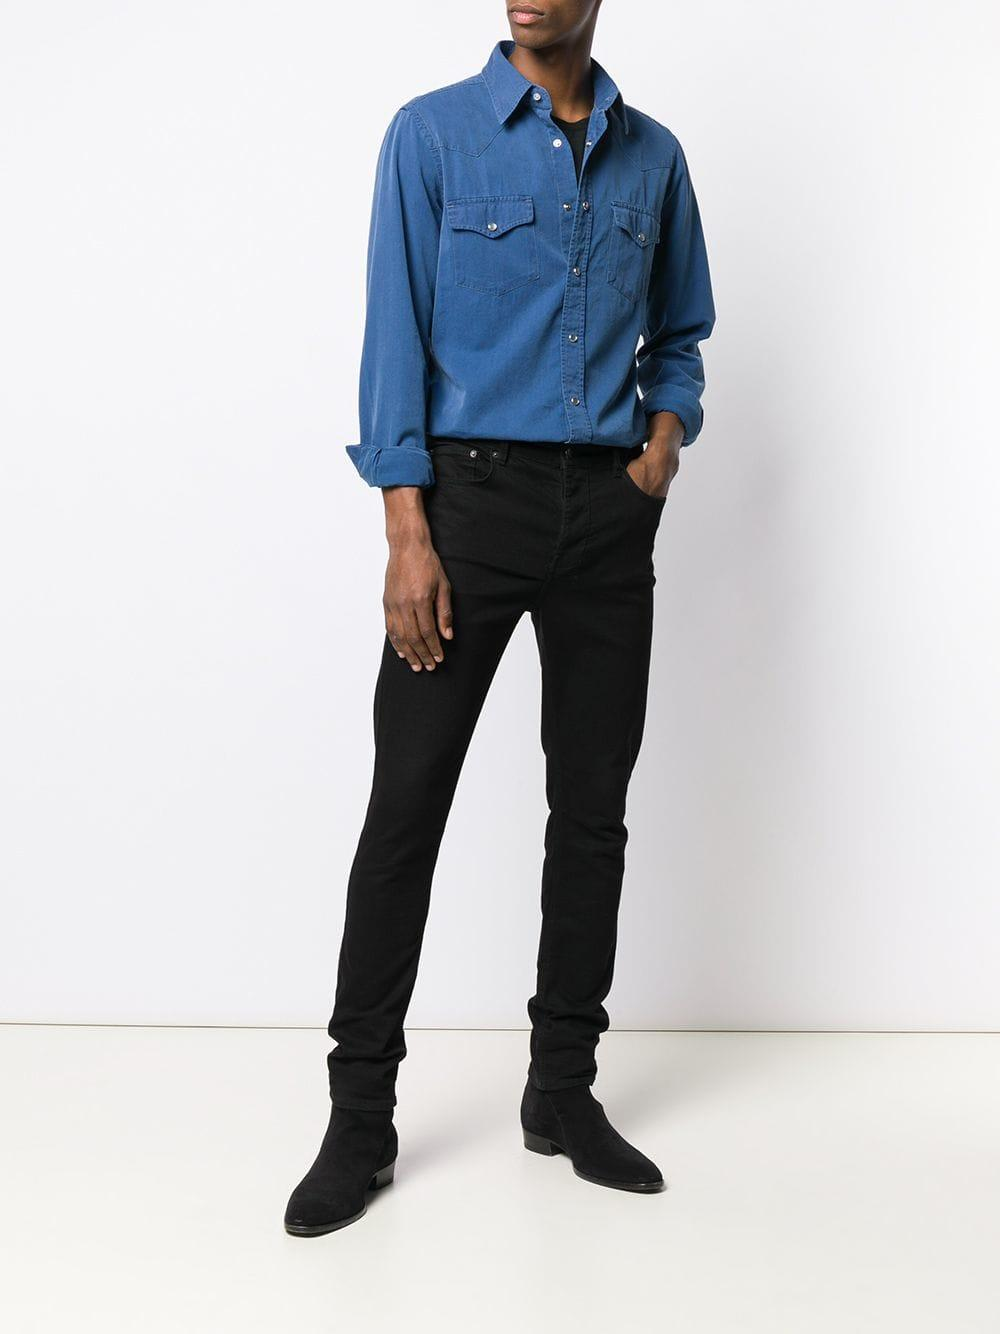 1aa6fbf6e82 Lyst - Tom Ford Press Stud Denim Shirt in Blue for Men